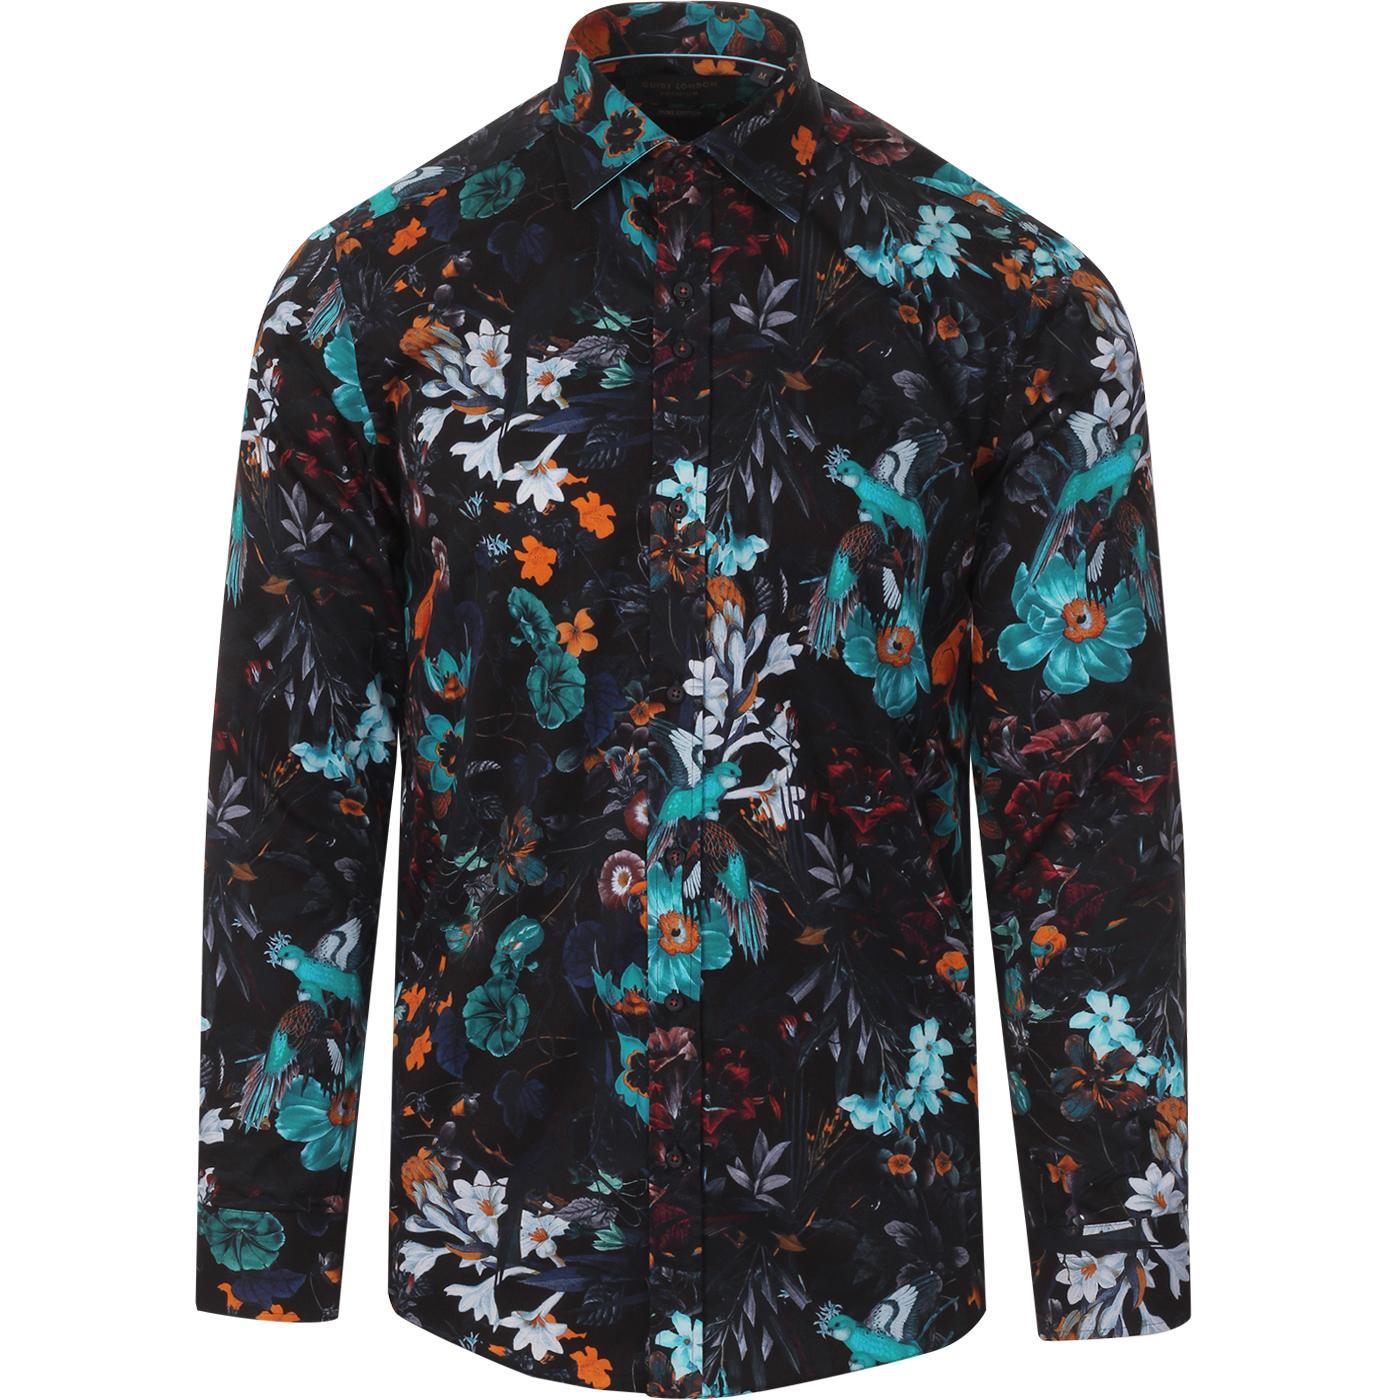 GUIDE LONDON Retro Mod Floral Bird Print Shirt (N)